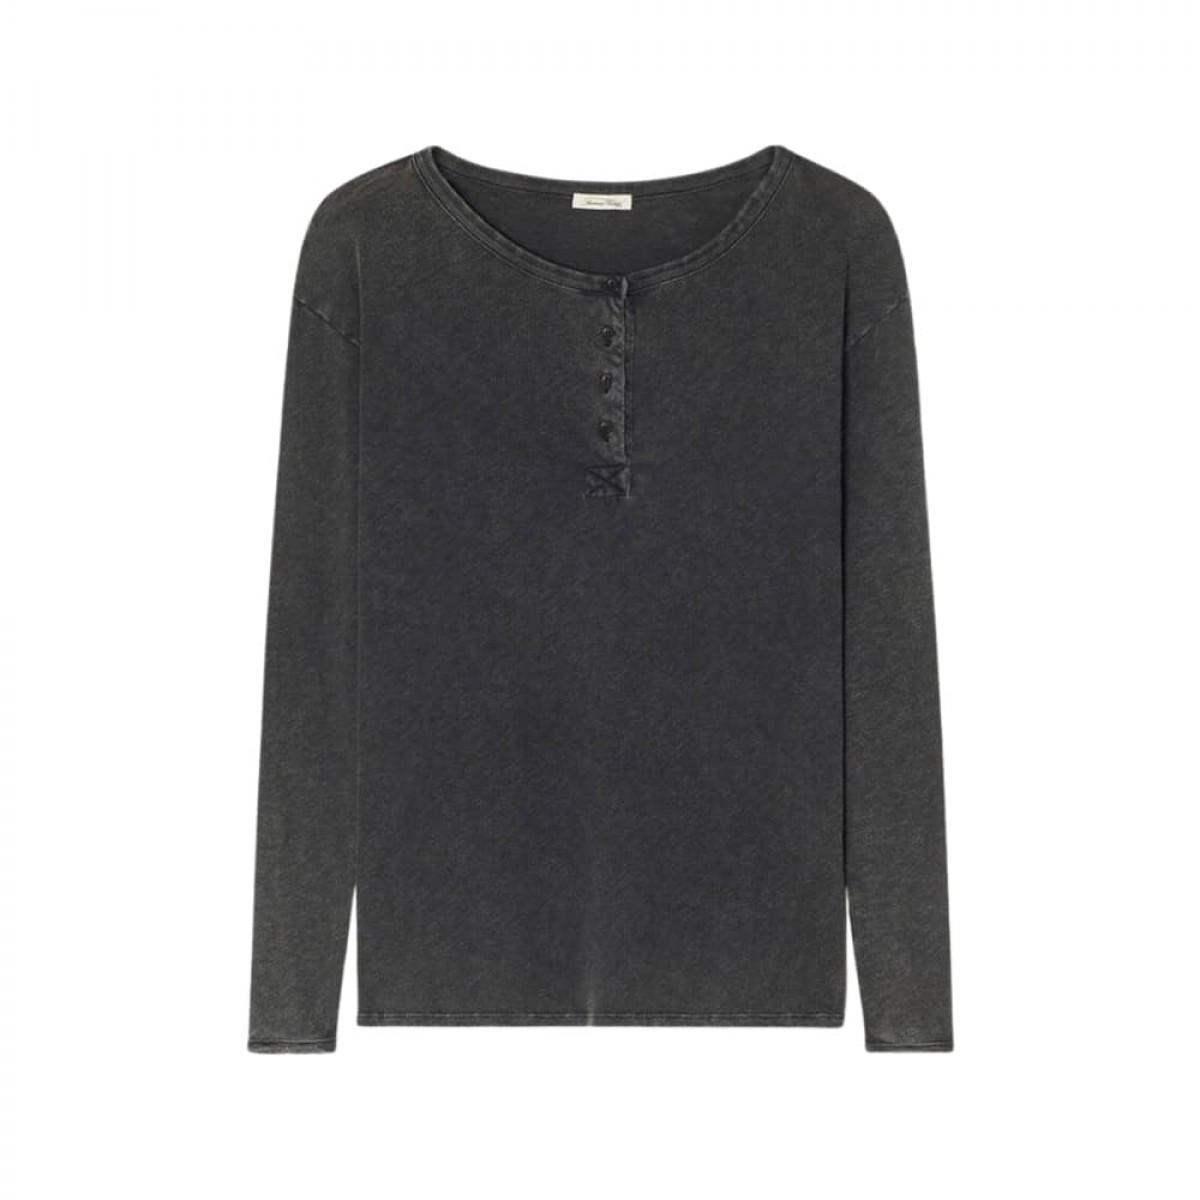 sonoma grandad bluse - vintage black - front